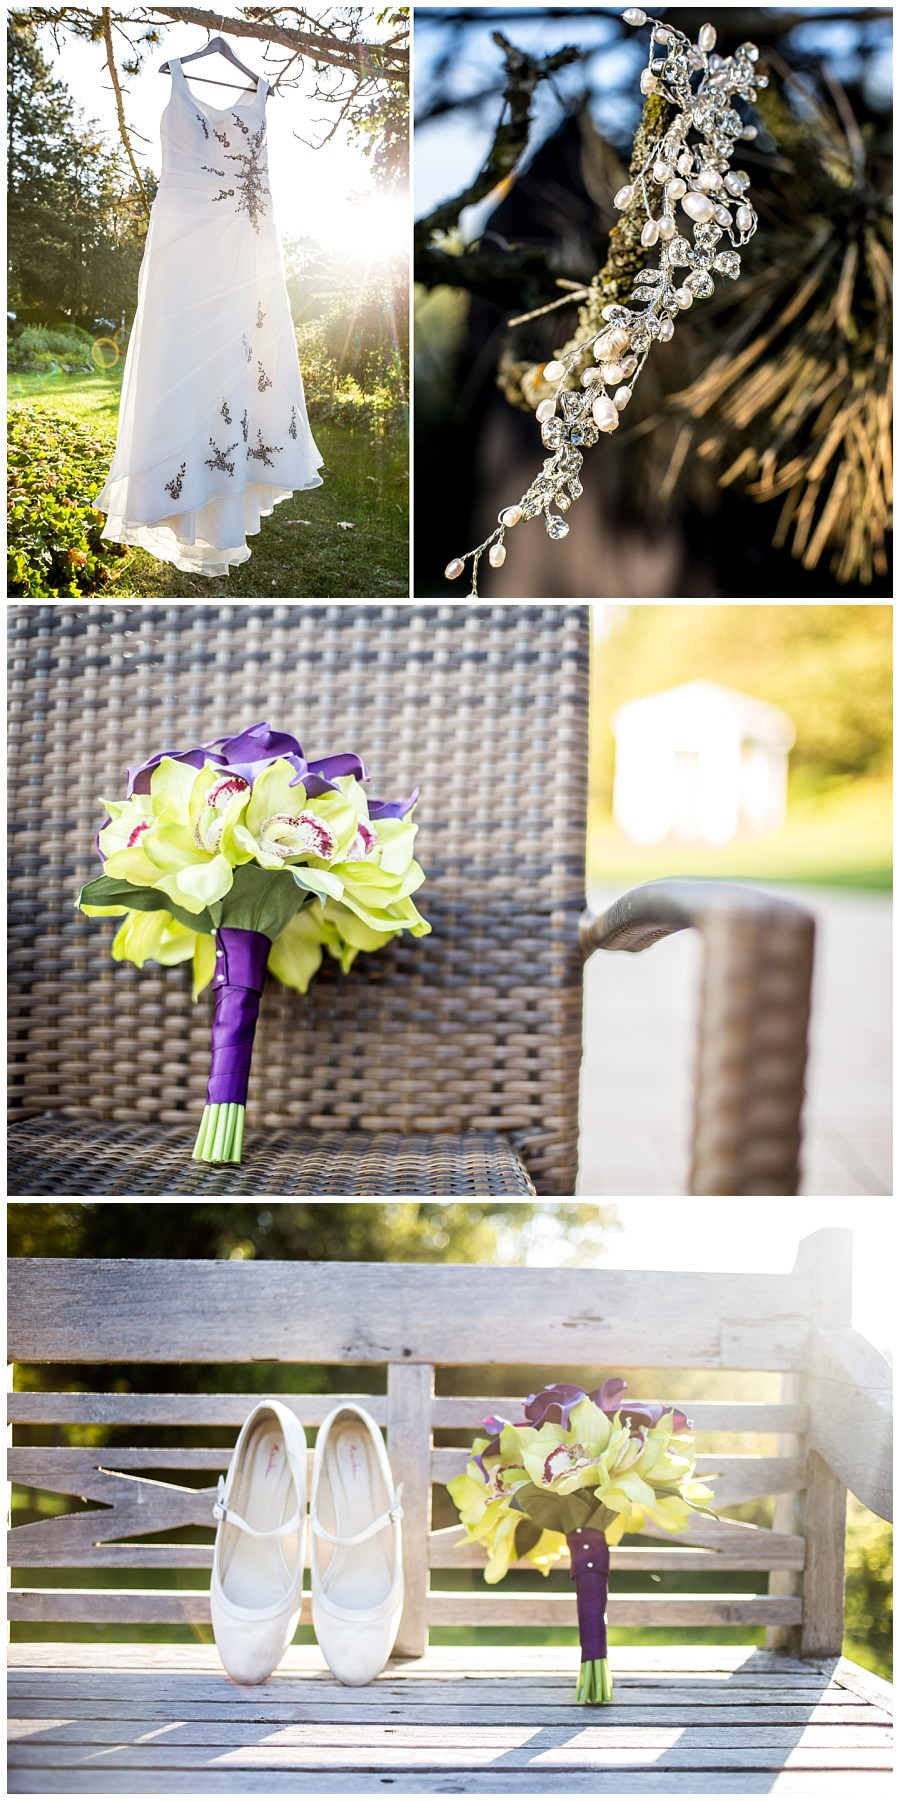 Hochzeit_Reitershof_Wirsberg_Claudia-Pelny-Fotografie_01